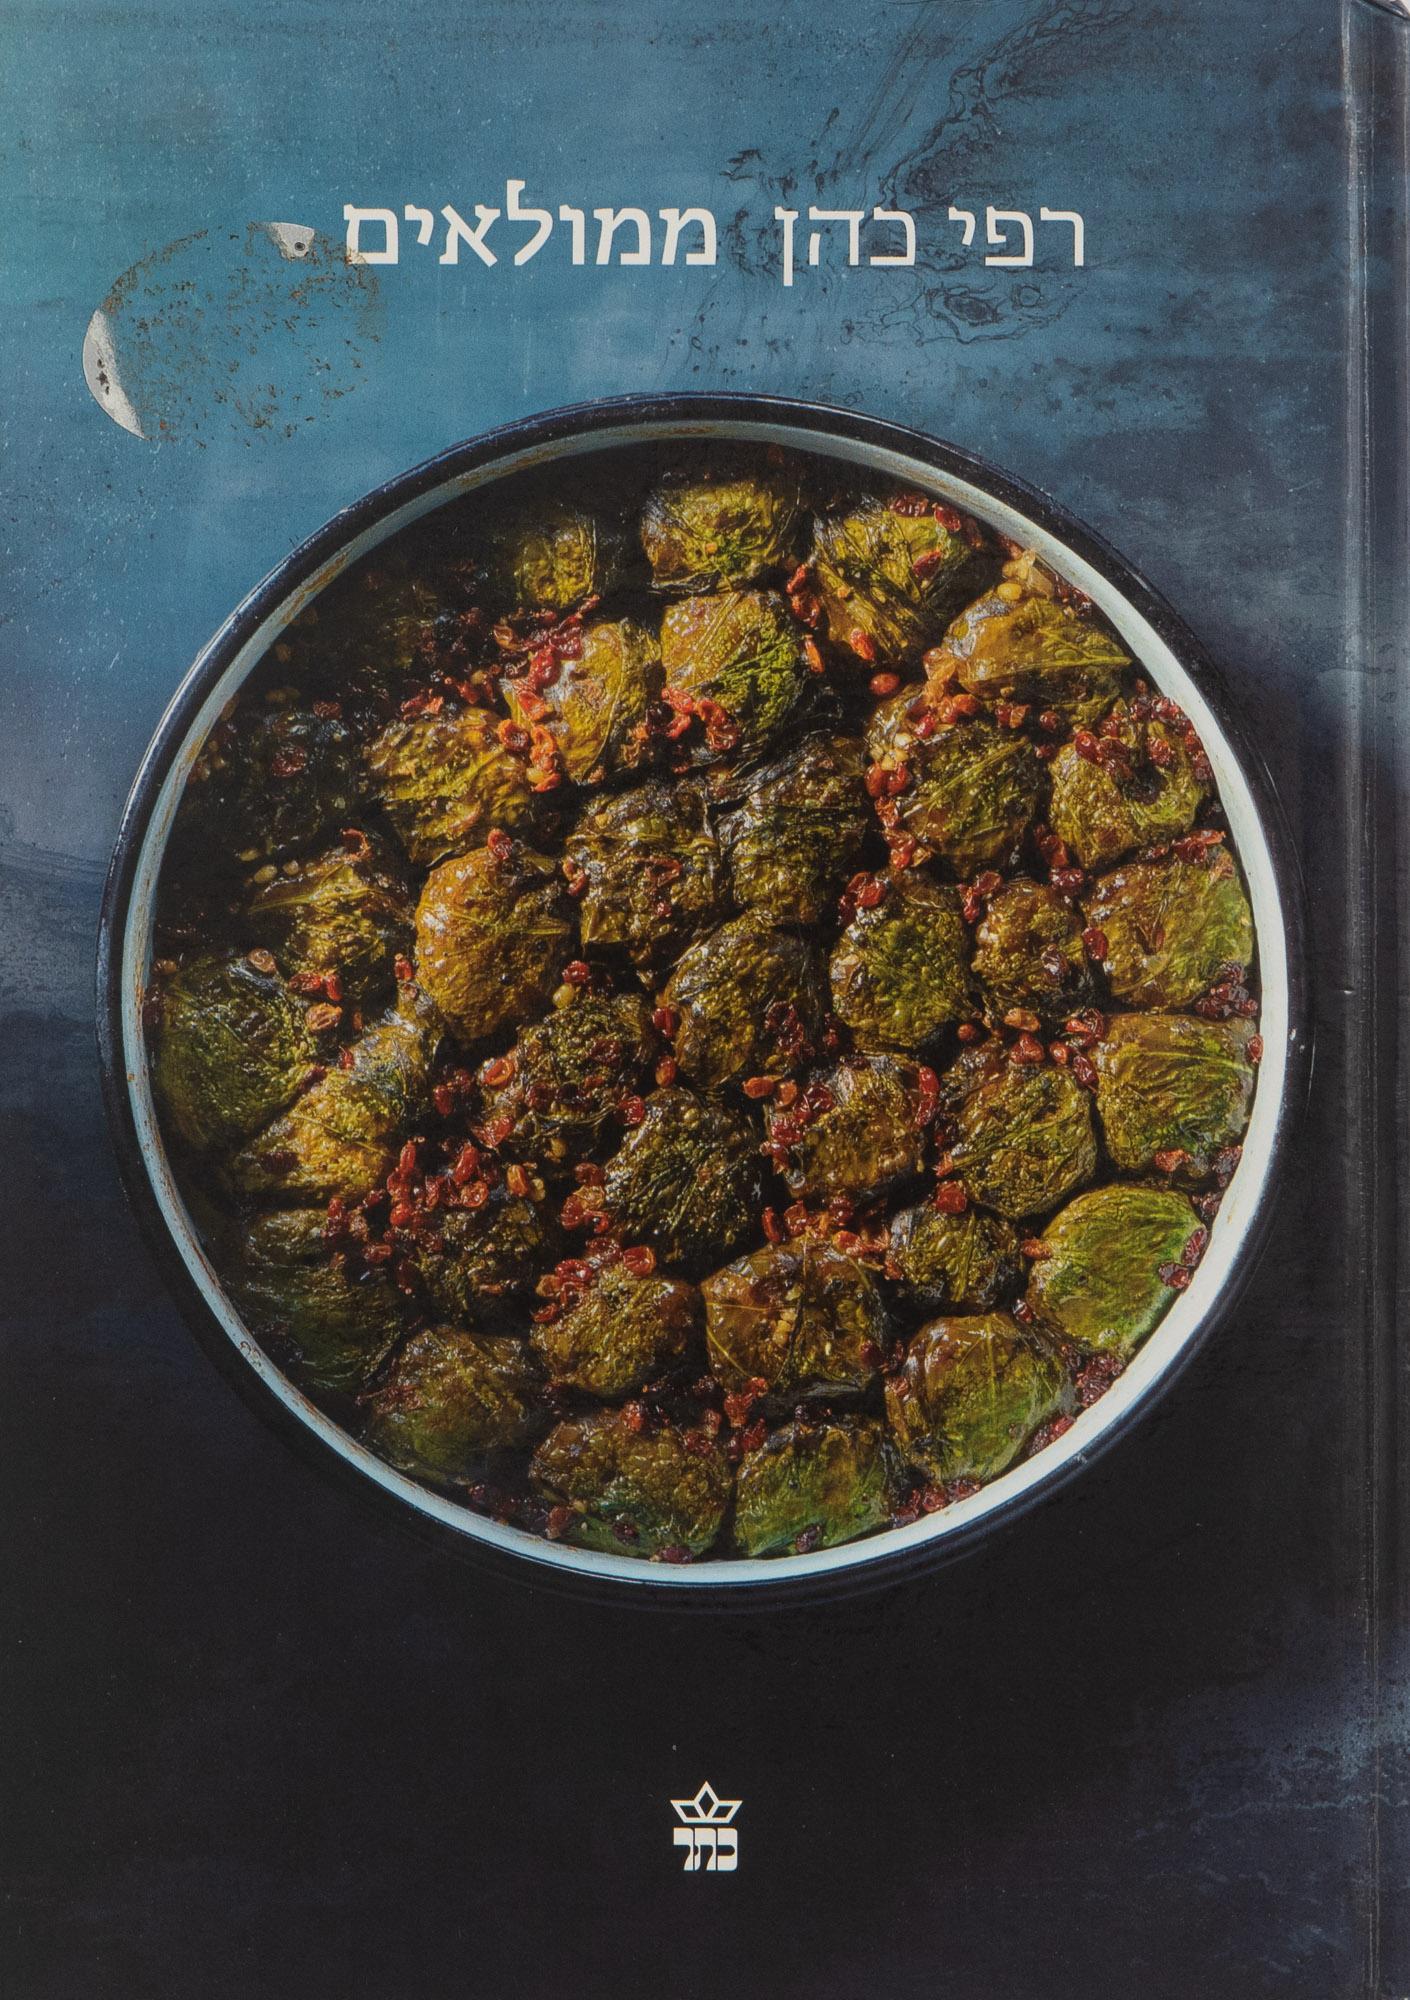 Cover of Israeli cookbook Memula'im (Stuffed Foods) by Rafi Cohen